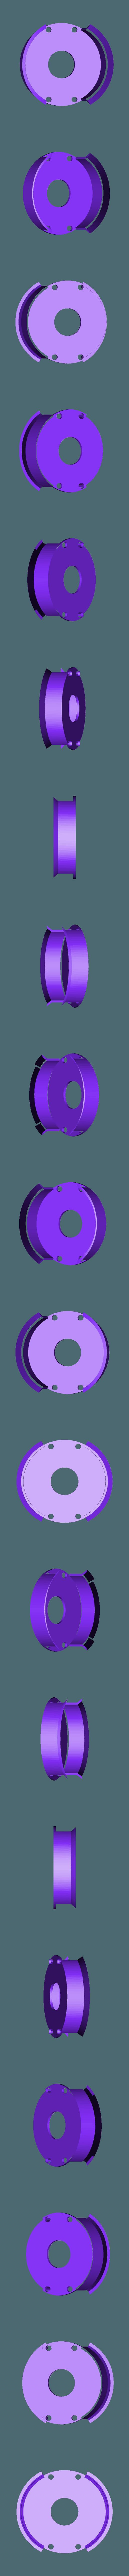 hallowing-holder.stl Télécharger fichier STL gratuit Animated Eye Candy Bowl Upgrade (en anglais seulement) • Design imprimable en 3D, Adafruit